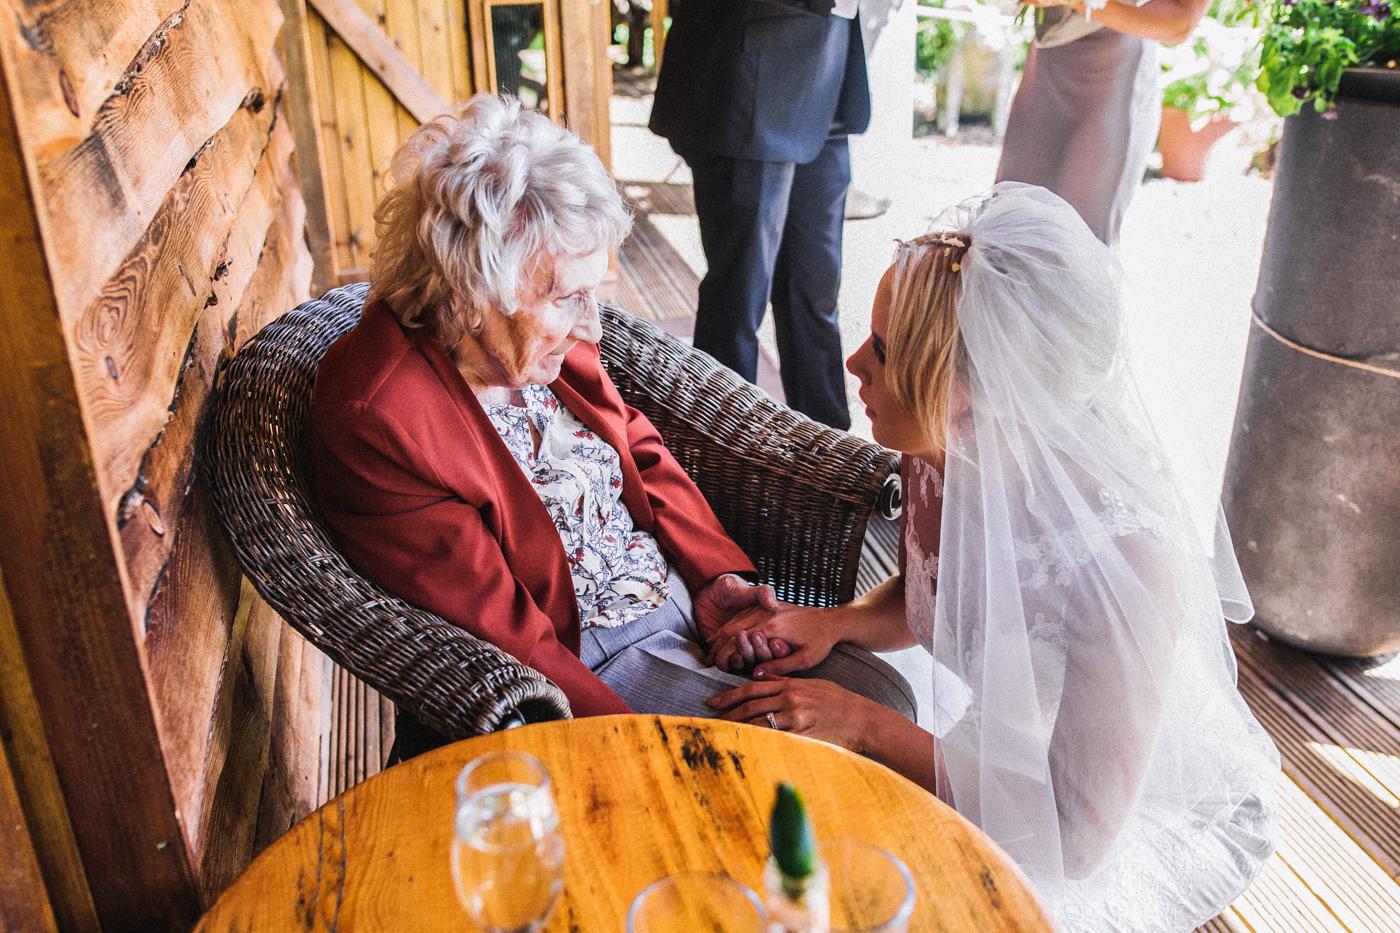 teesside-middlesbrough-north-east-wedding-photographer-creative-wedding-venues-0011.jpg